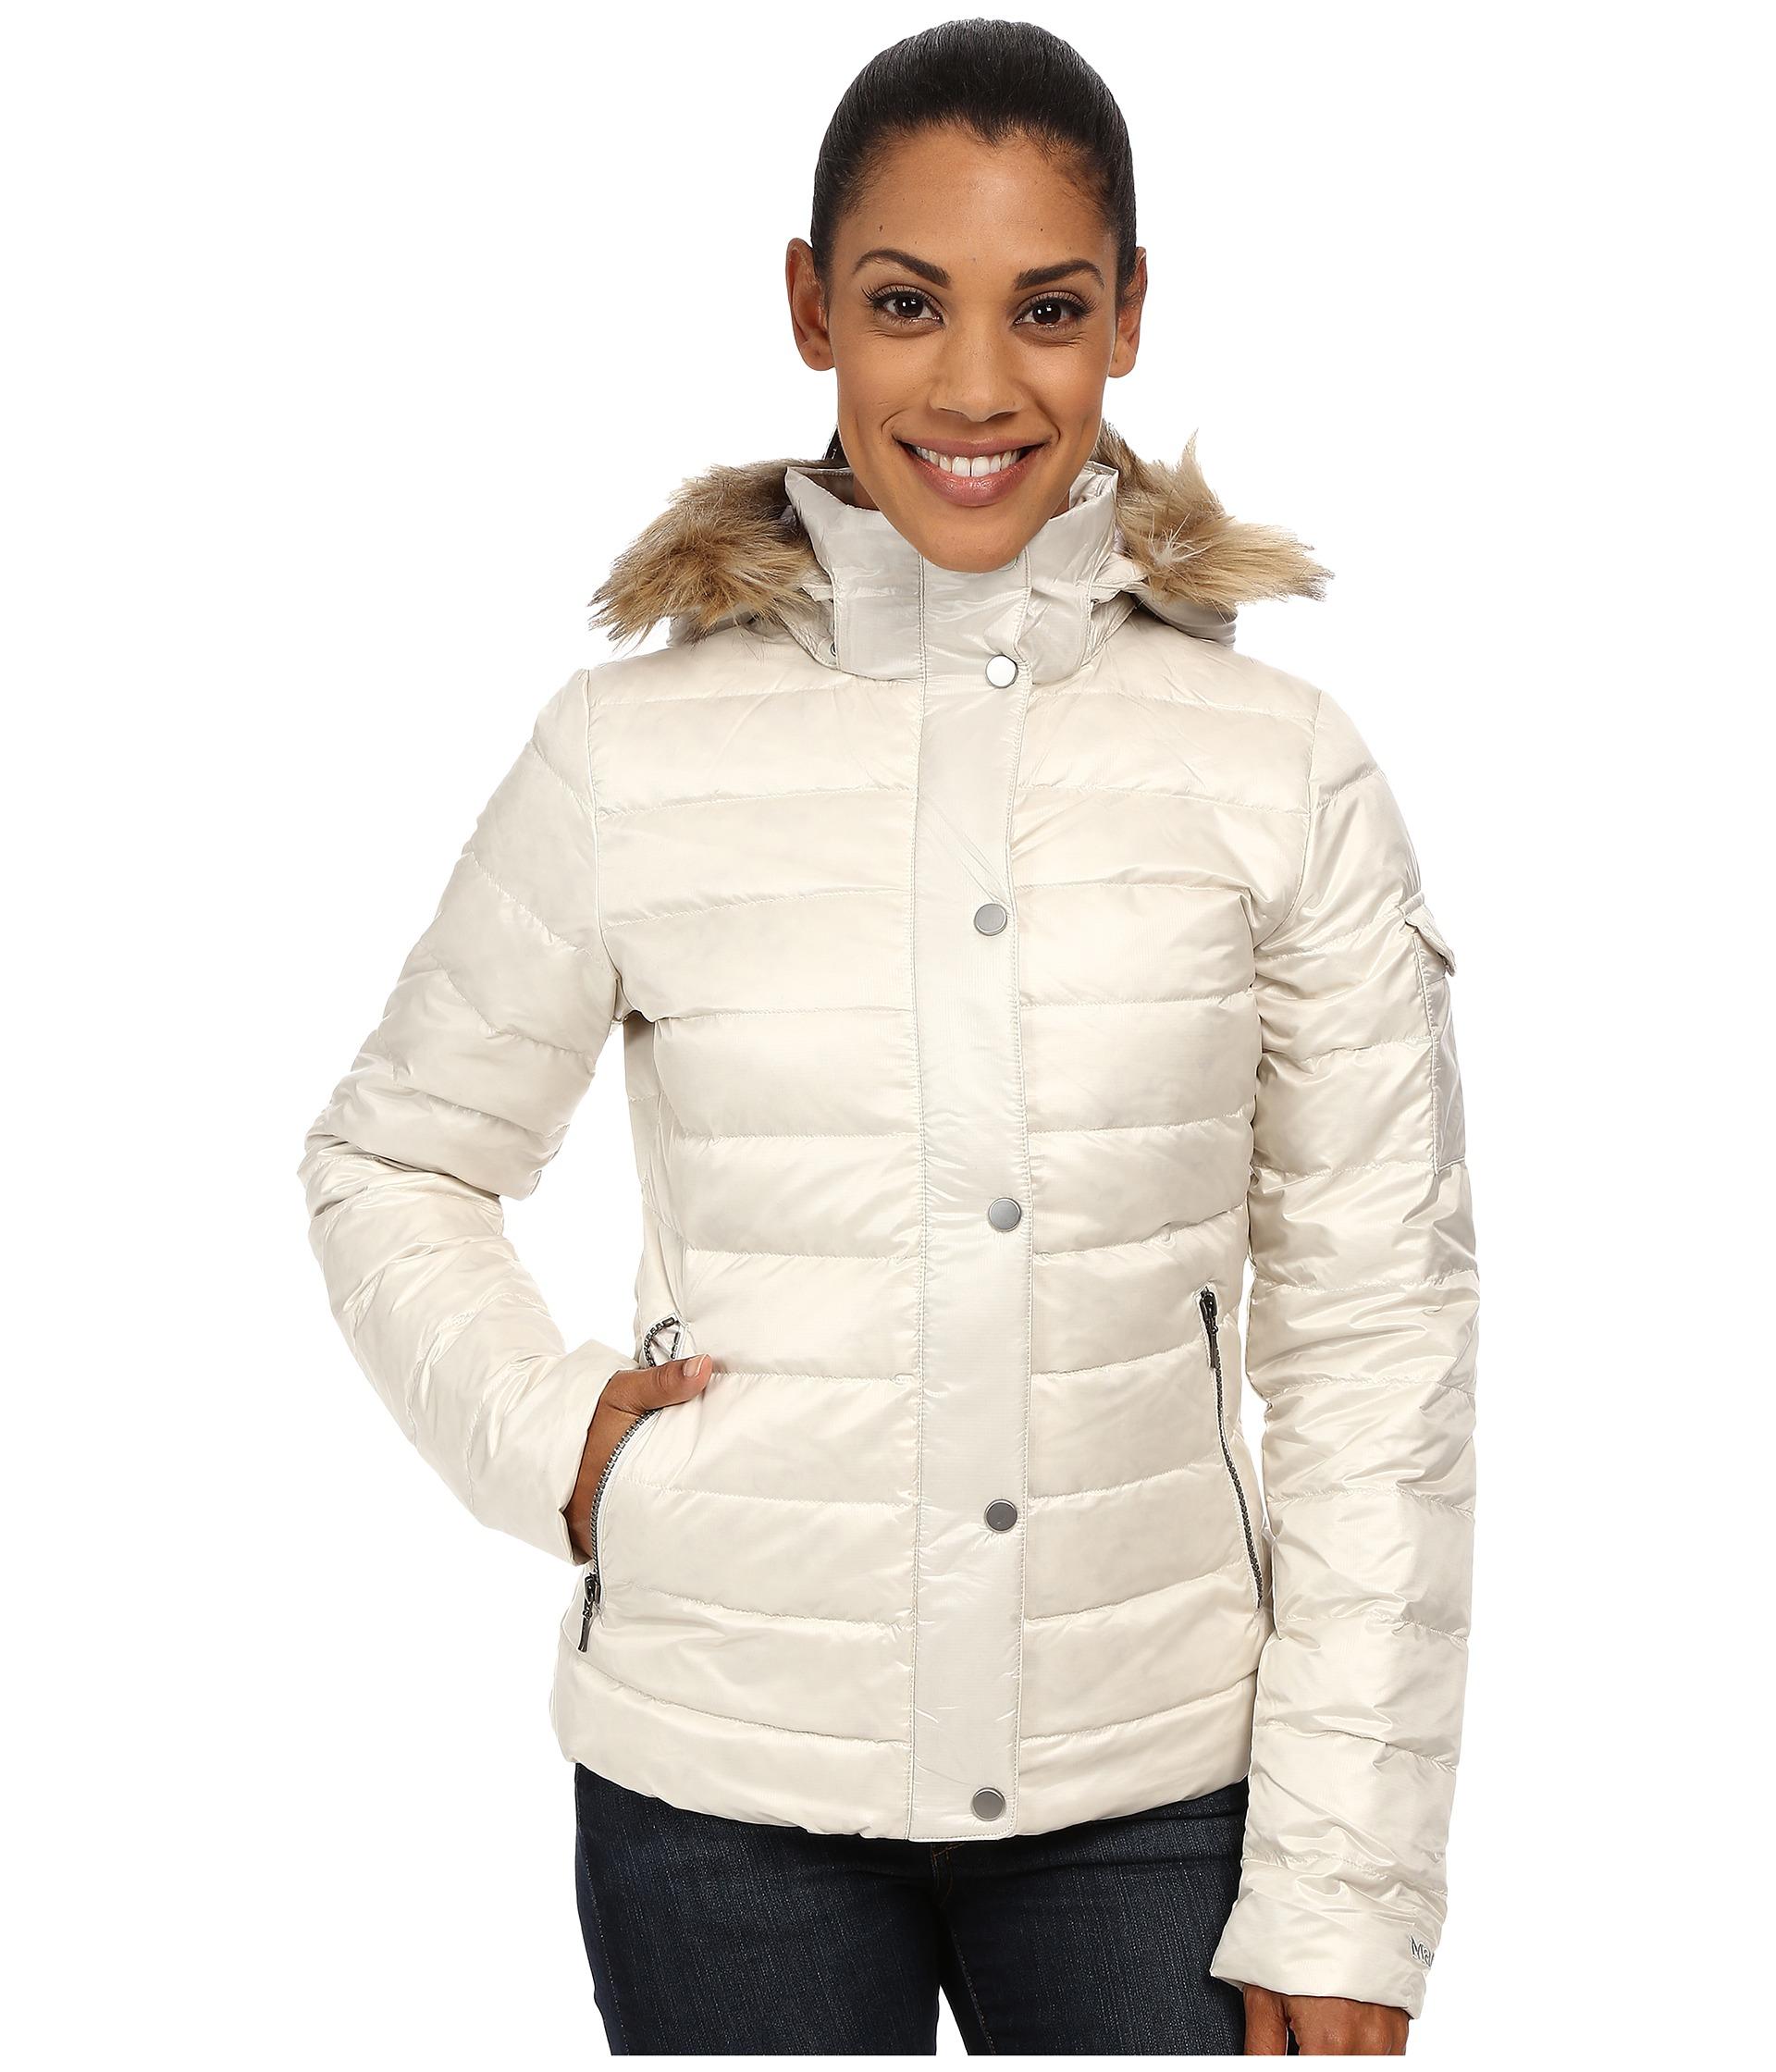 0325163c1 Lyst - Marmot Hailey Jacket in White